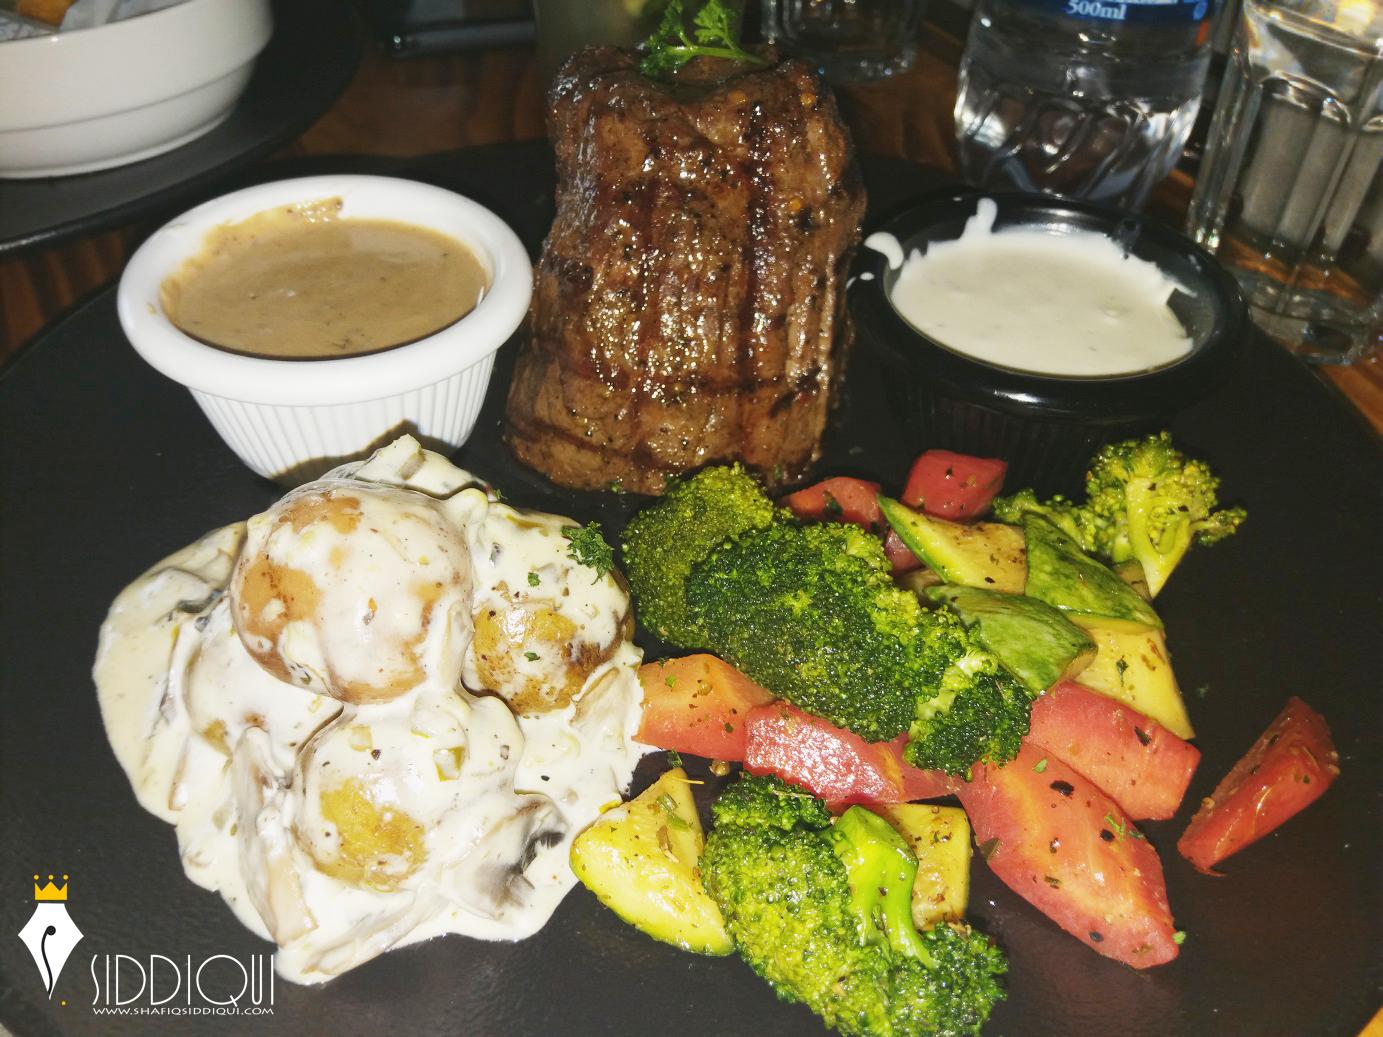 Meat-the-cheese-shafiq-siddiqui-7